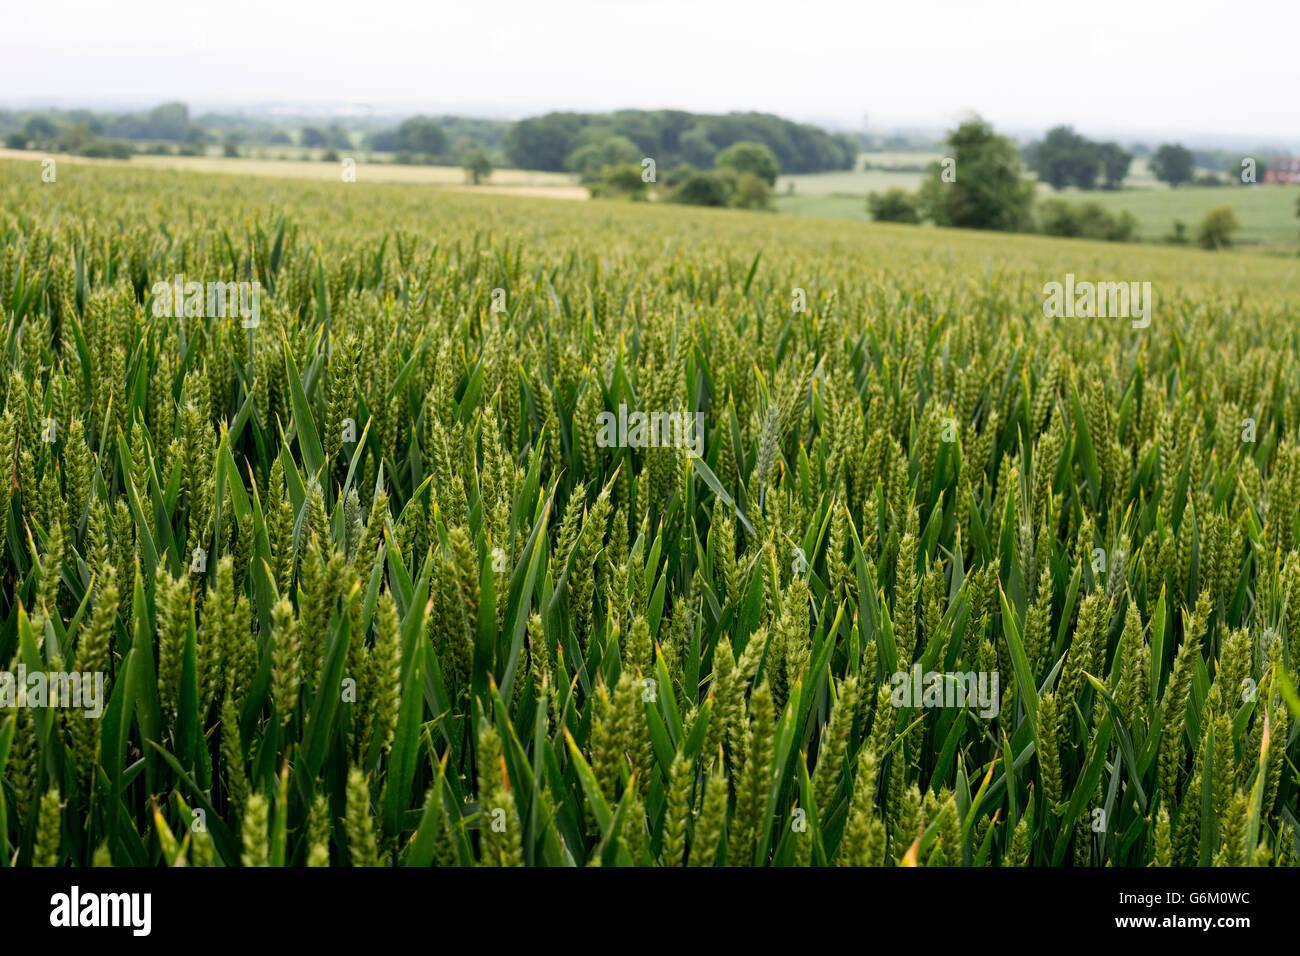 Field of unripe wheat, Warwickshire, UK - Stock Image